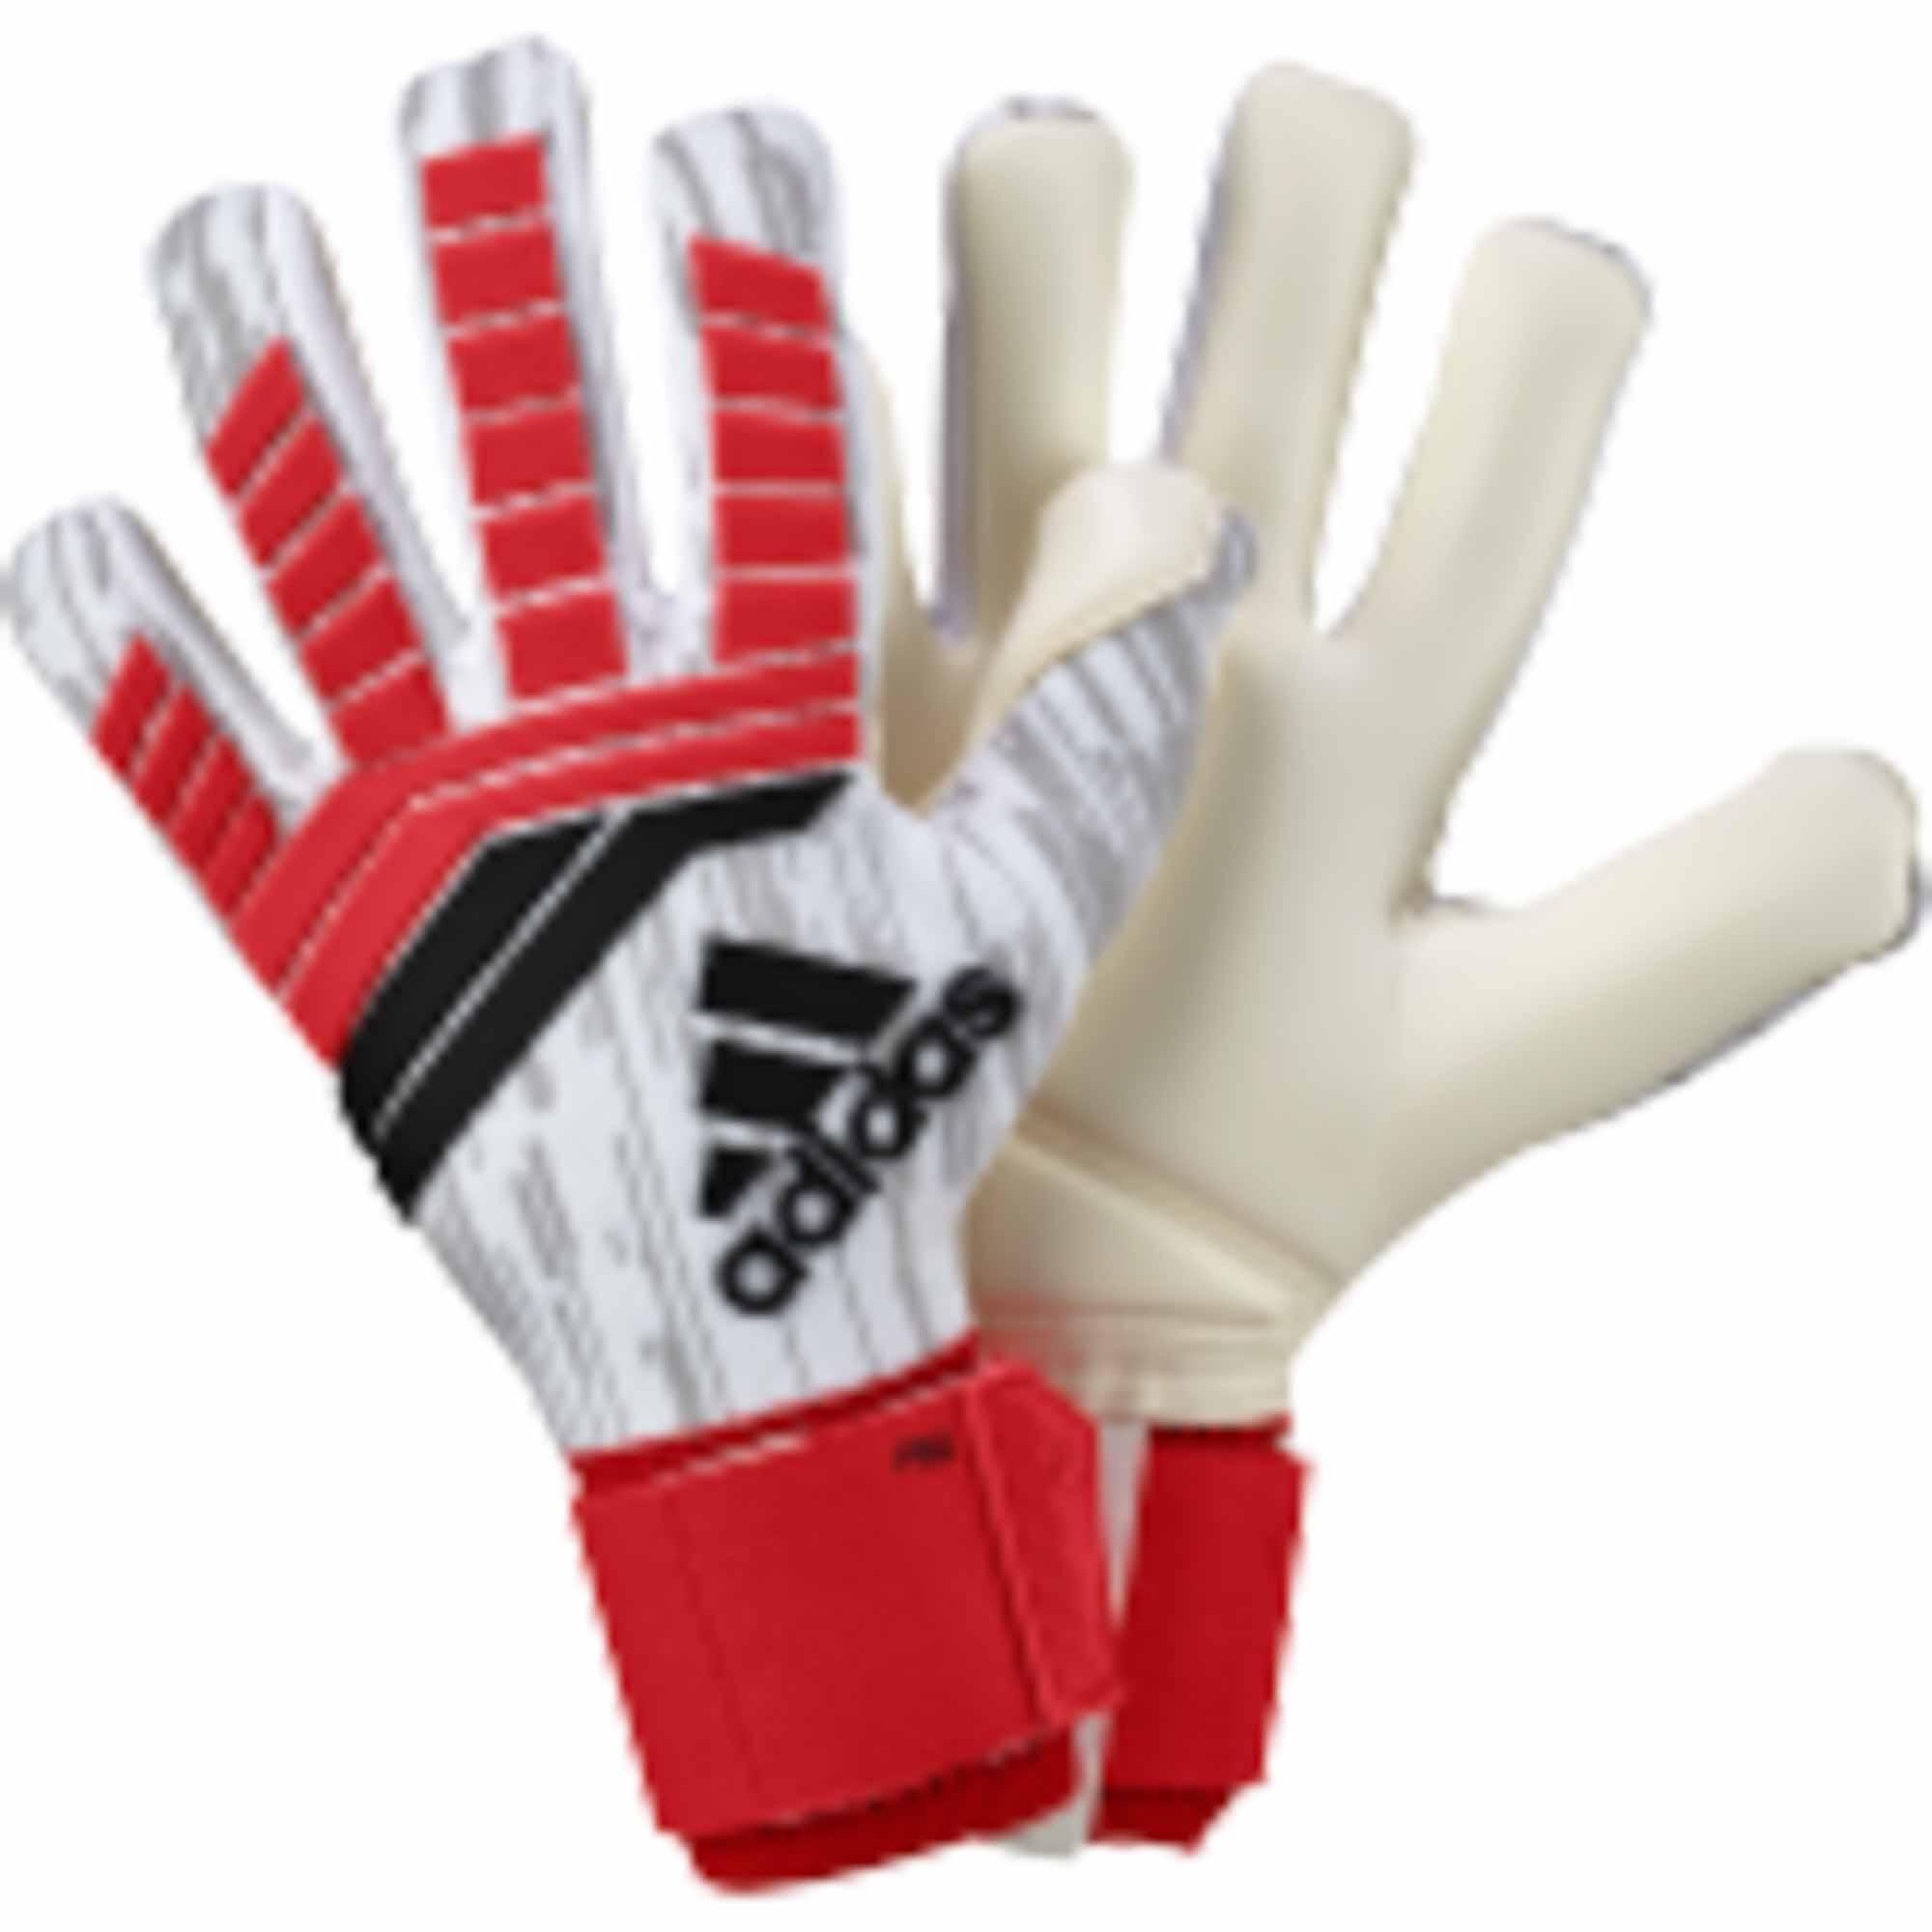 adidas Predator Pro Goalkeeper Gloves - Real Coral & Black ...